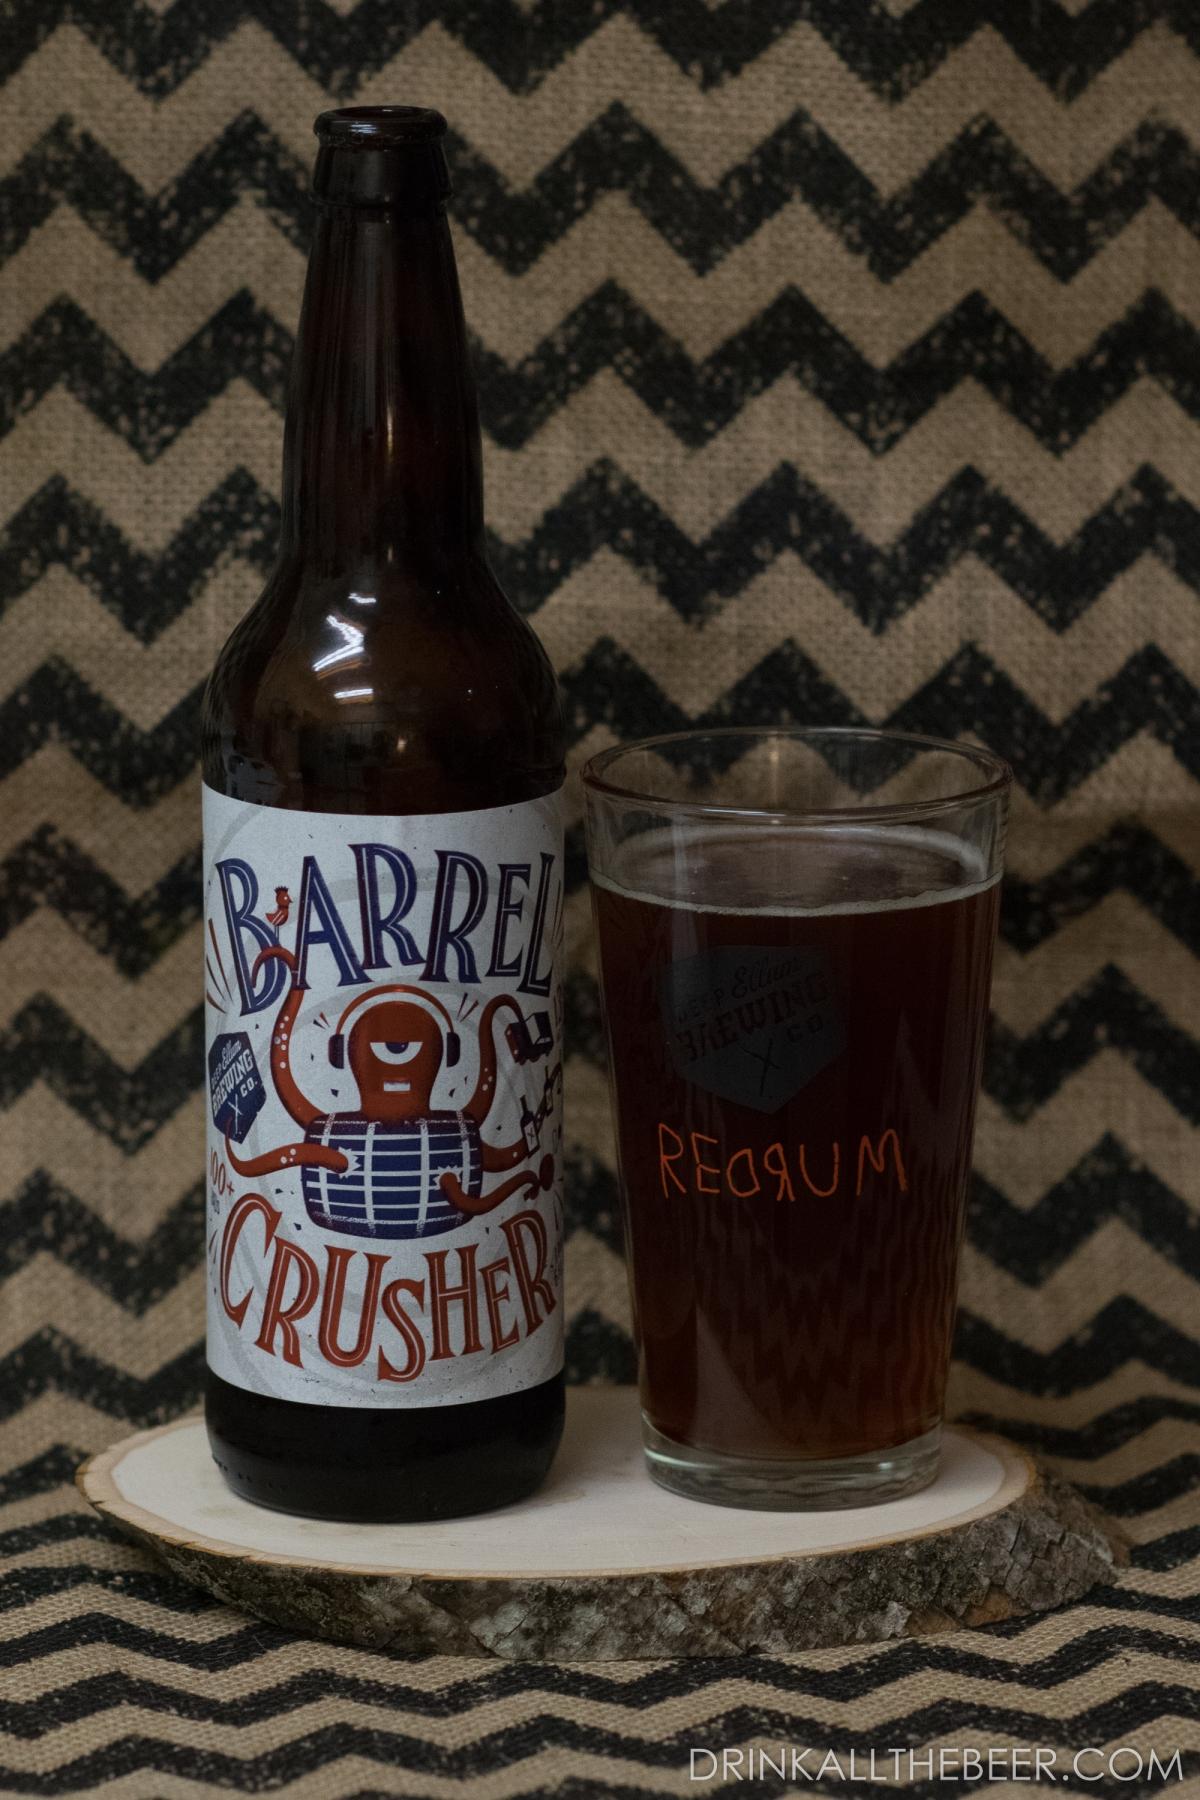 Day 047 – BarrelCrusher